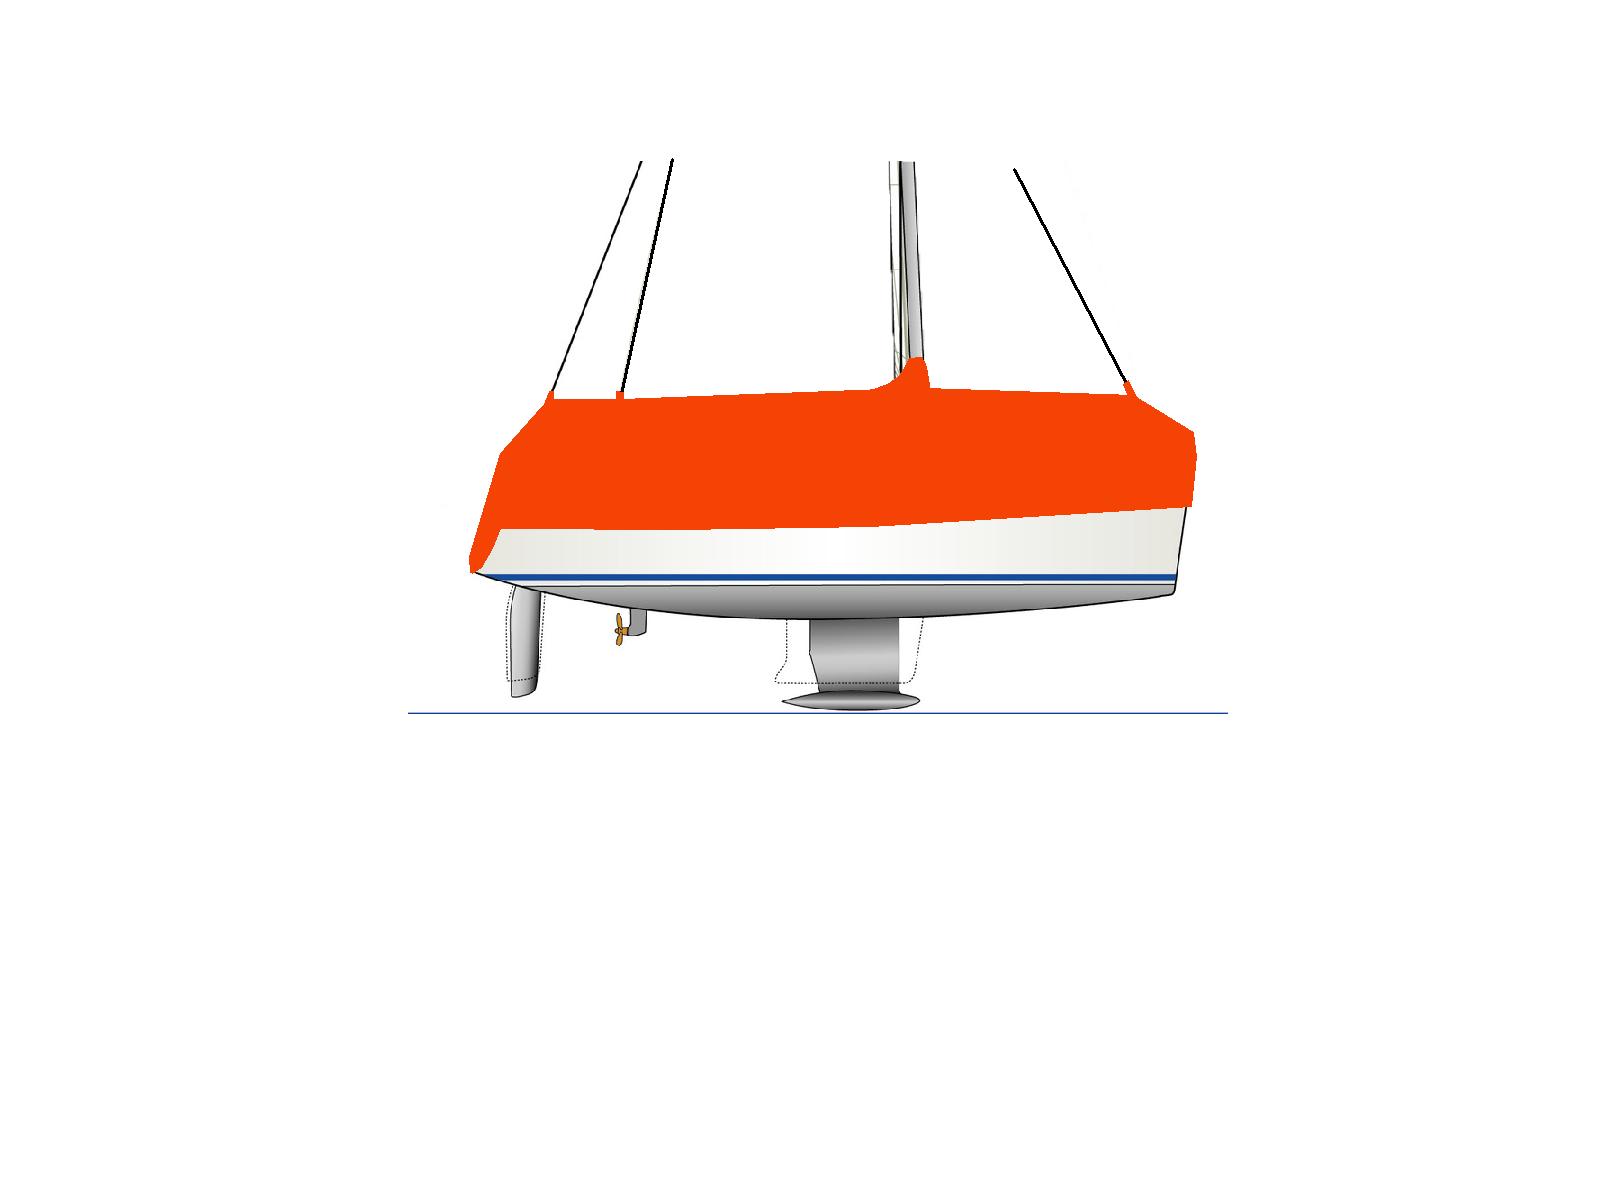 01 02  Typ B Segelboot GP  Rand ca. 90 cm.PNG